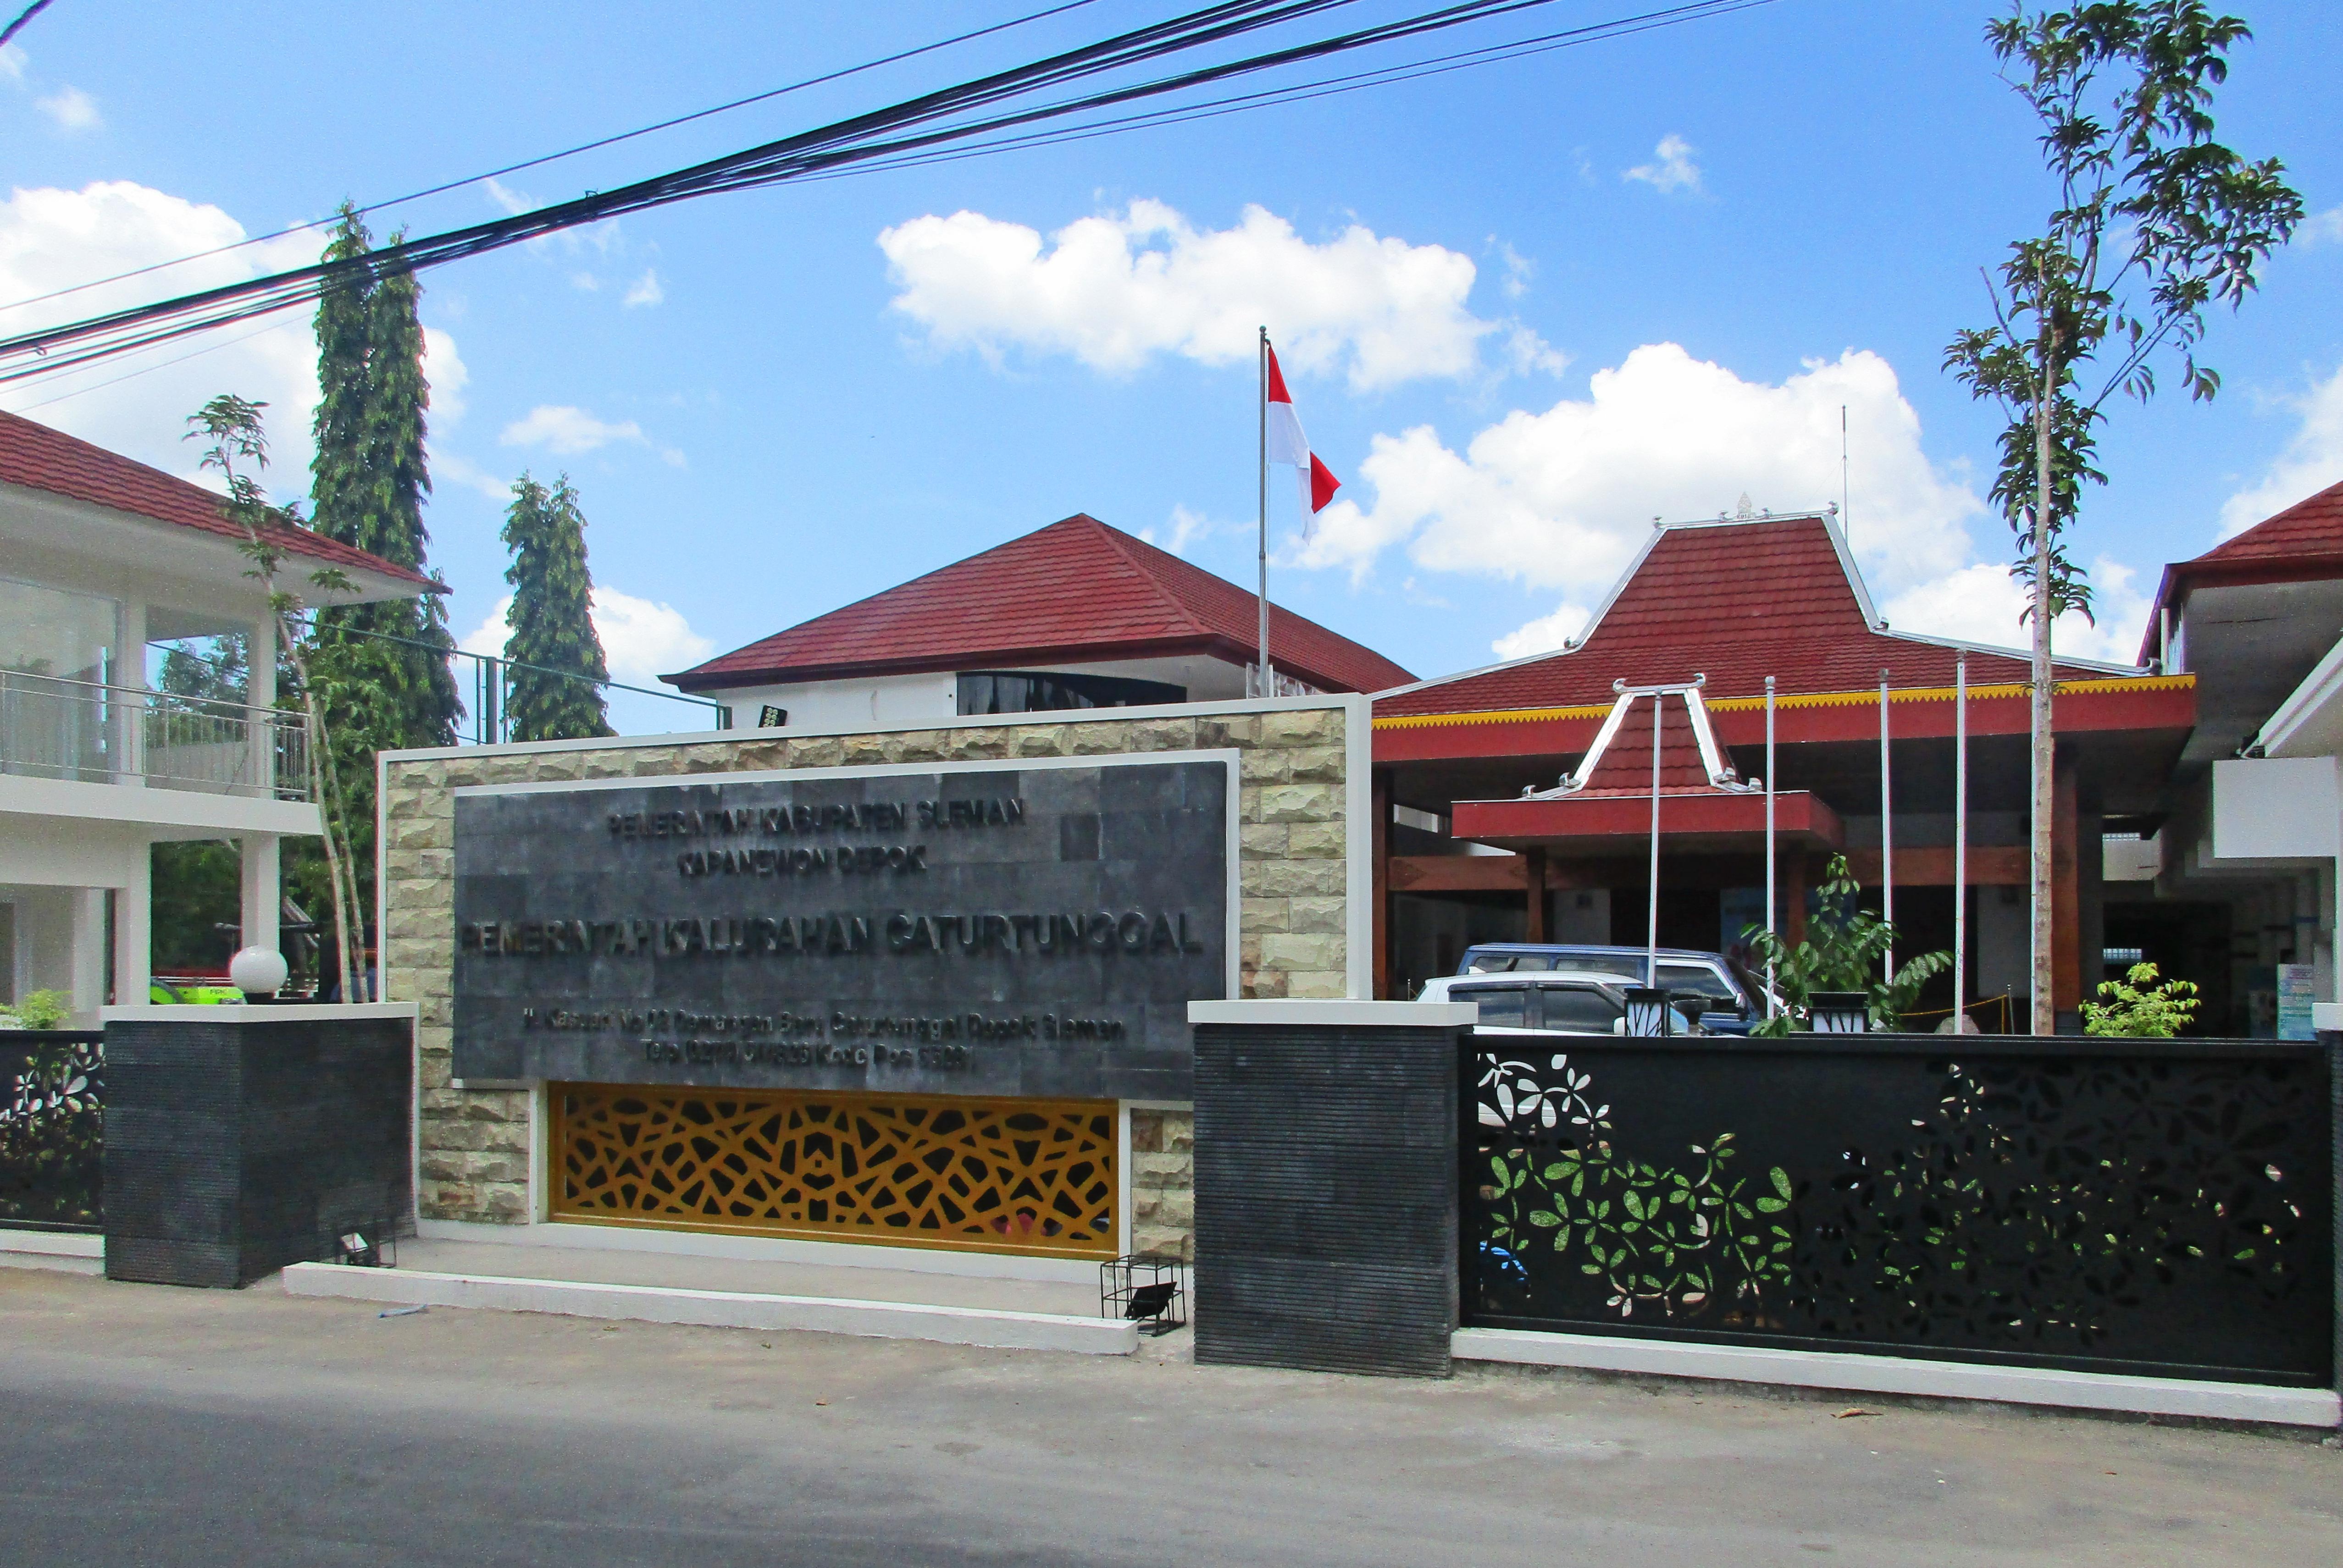 Caturtunggal Depok Sleman Wikipedia Bahasa Indonesia Ensiklopedia Bebas